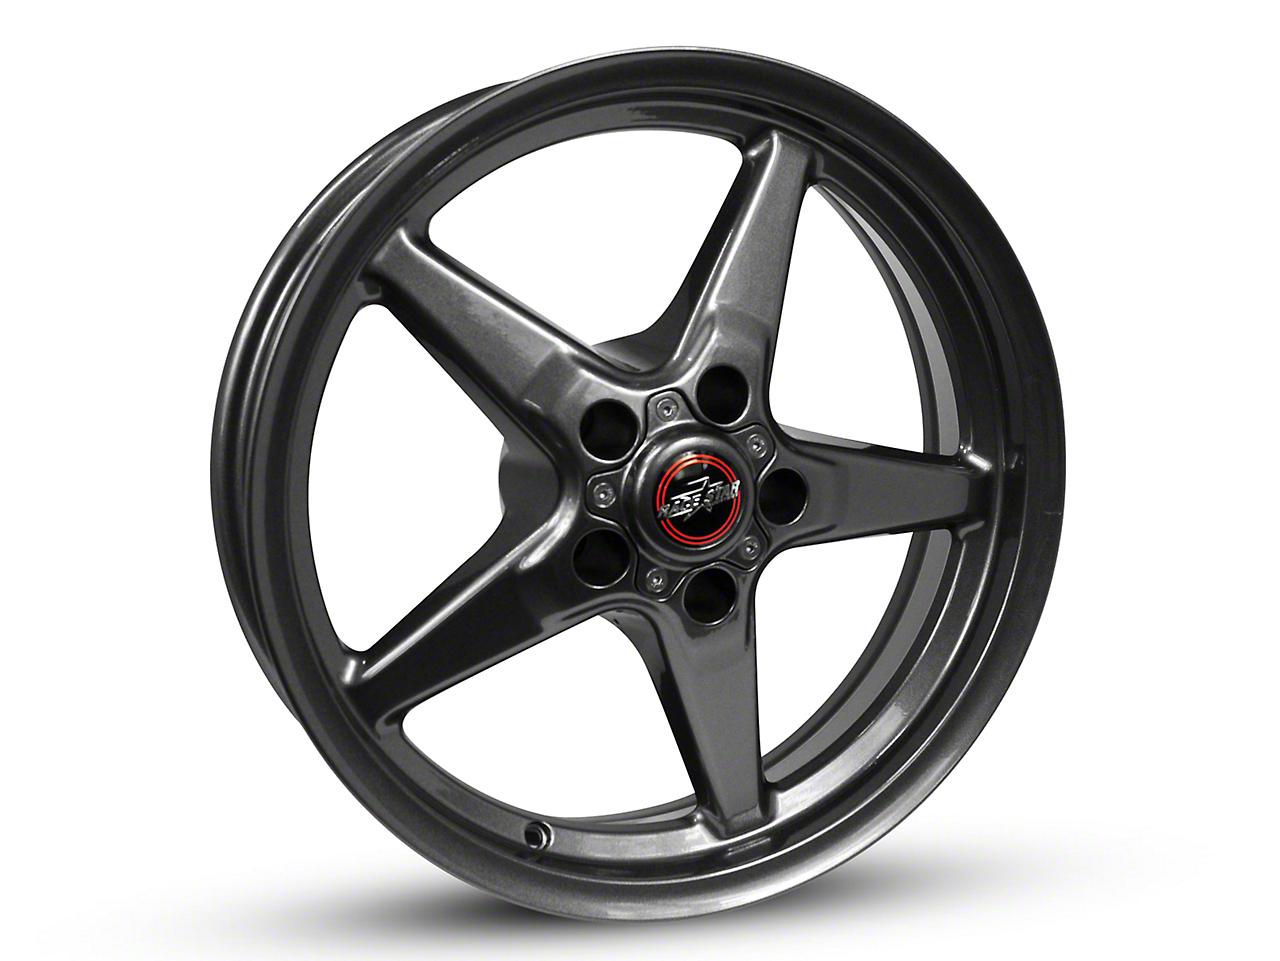 Race Star 92 Drag Star Bracket Racer Metallic Gray Wheel - 17x7 (87-93 w/ 5 Lug Conversion)